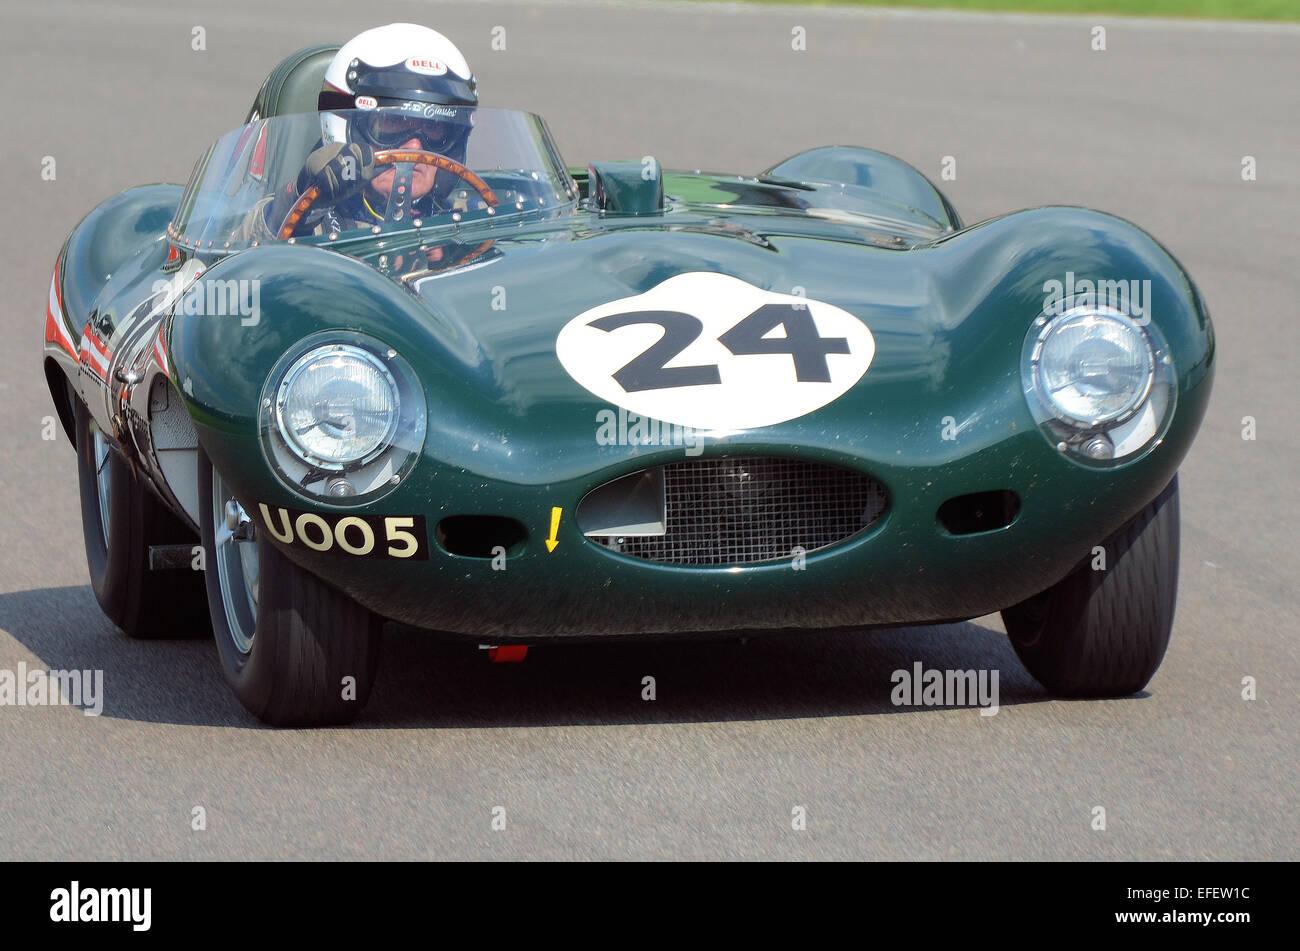 the-jaguar-d-type-is-a-sports-racing-car